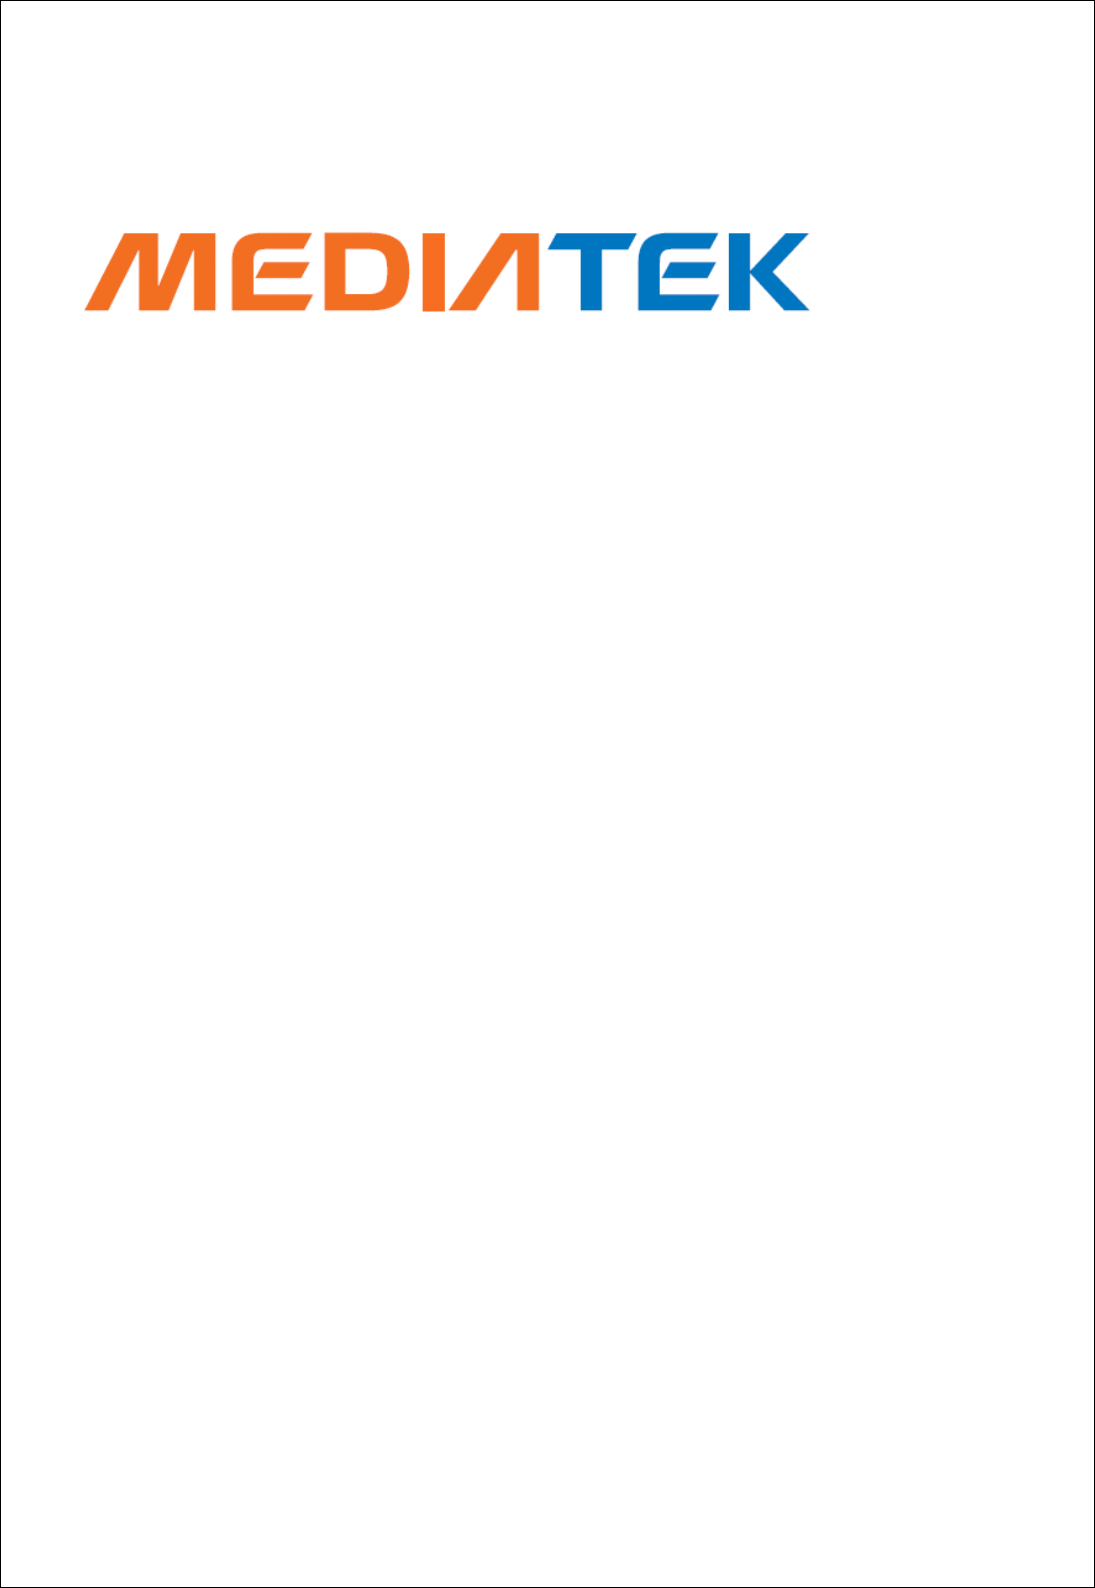 MEDIATEK ETS PORT WINDOWS 7 X64 DRIVER DOWNLOAD